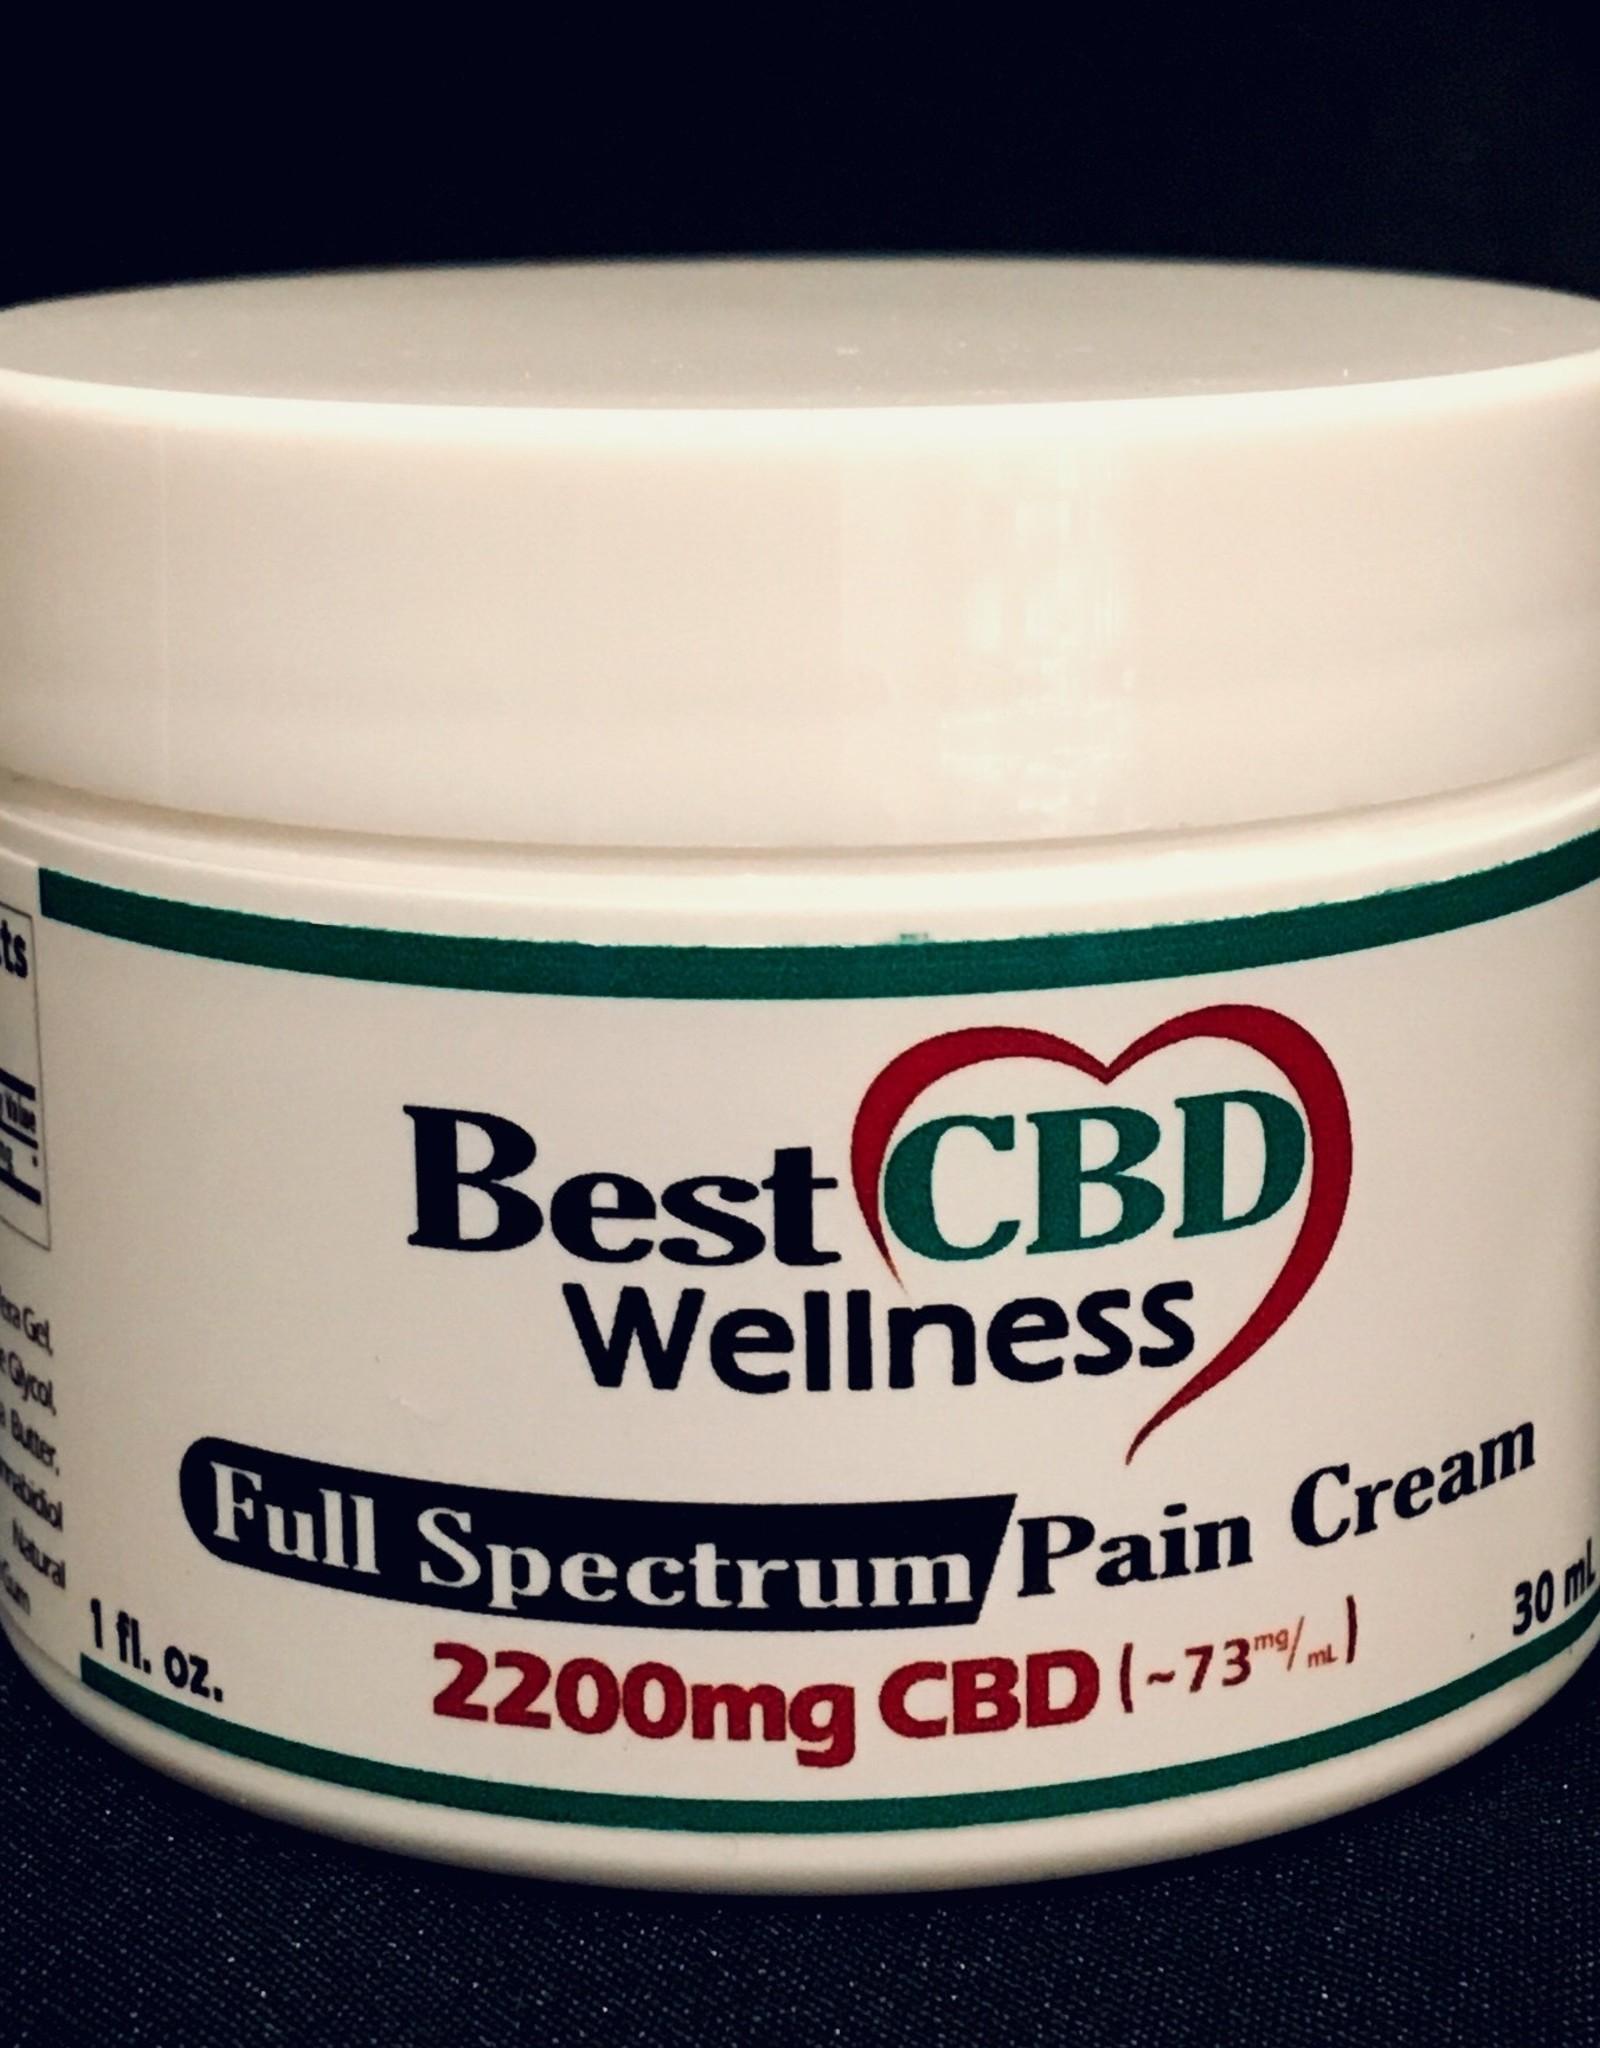 Best CBD Wellness Full Spectrum CBD Pain Cream 2200mg/73mg/ml 1oz